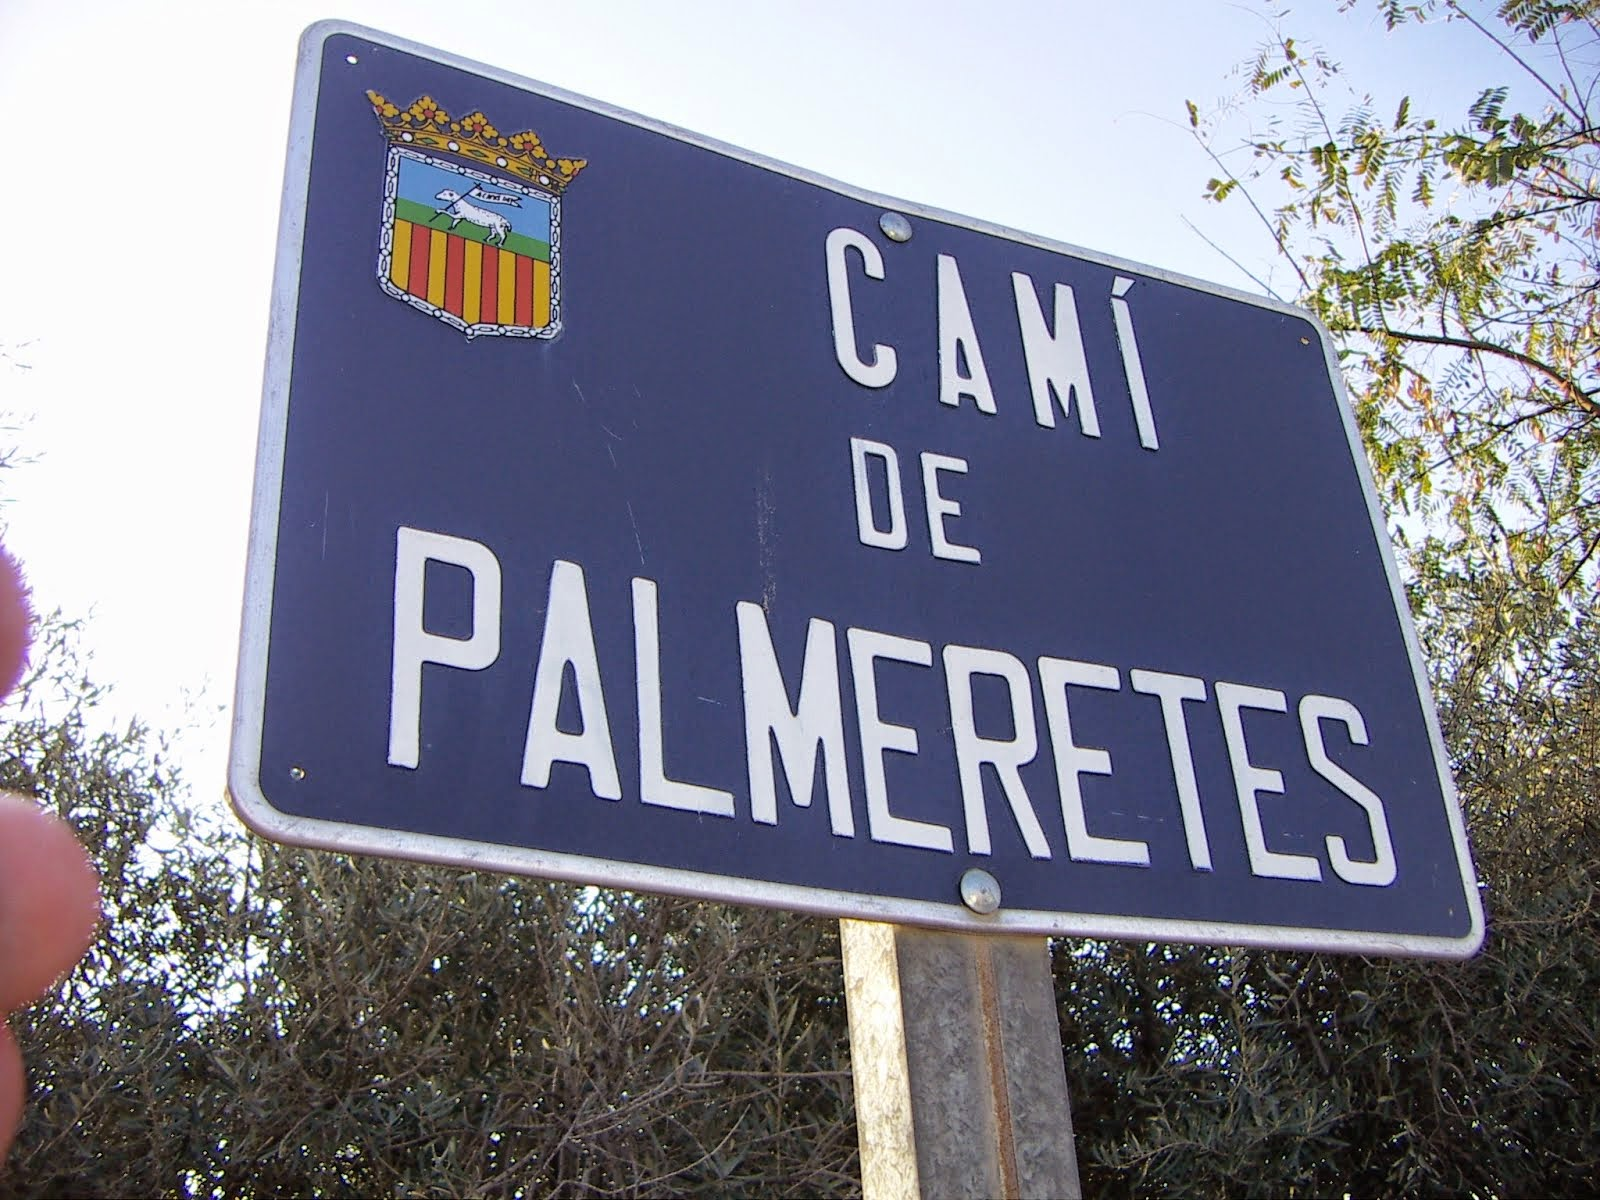 Camí de Palmeretes